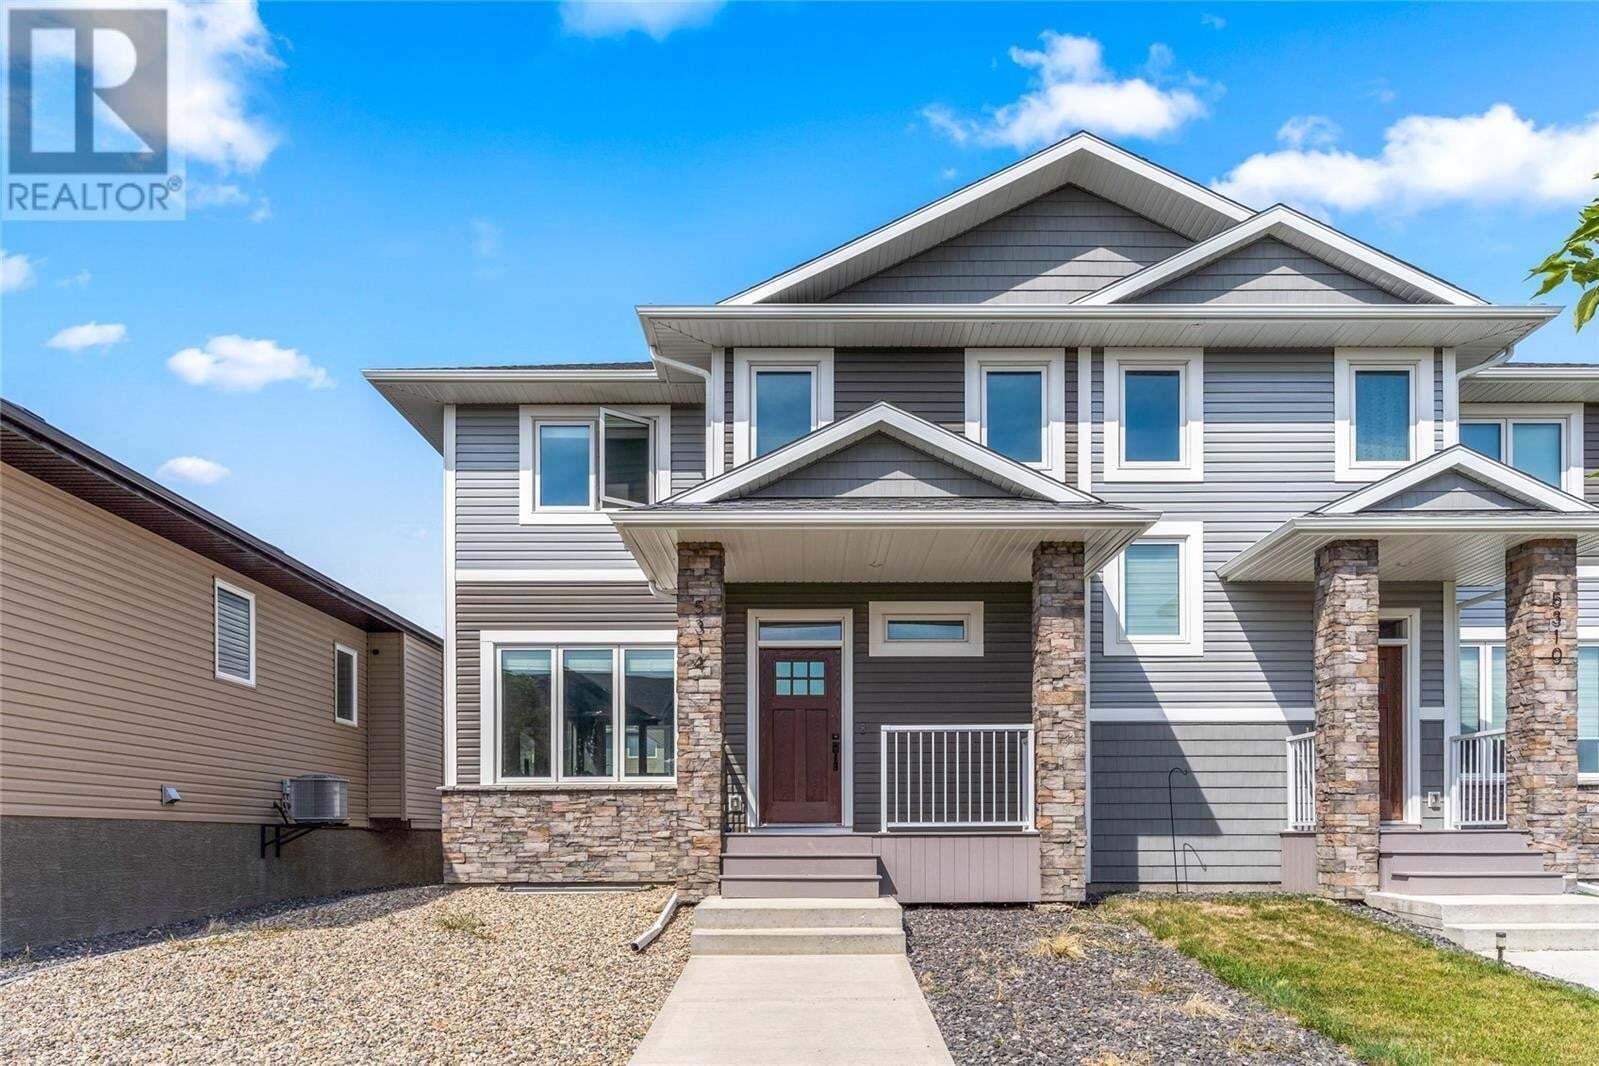 House for sale at 5314 Mcclelland Dr Regina Saskatchewan - MLS: SK823457